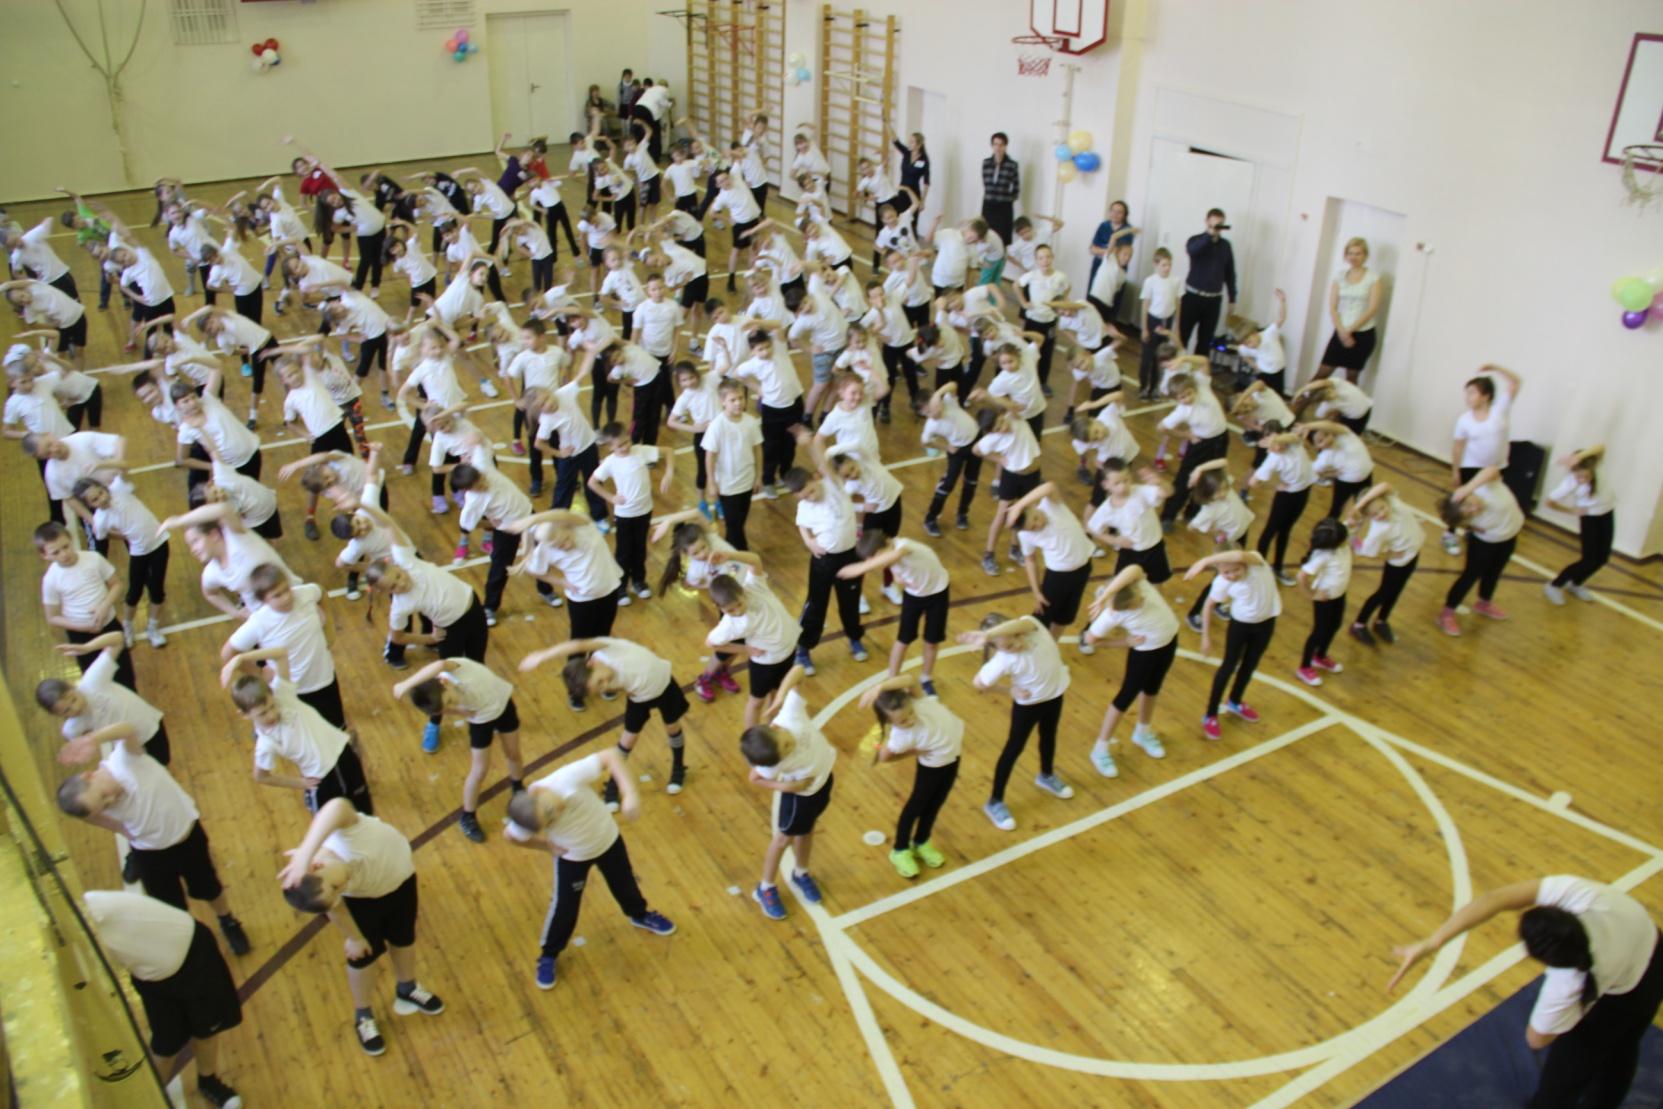 D:\фото\школа2015\солгечная спартакиада 2015\07.10.2015 открытие СС фитнес калейдаскоп\IMG_0280.JPG